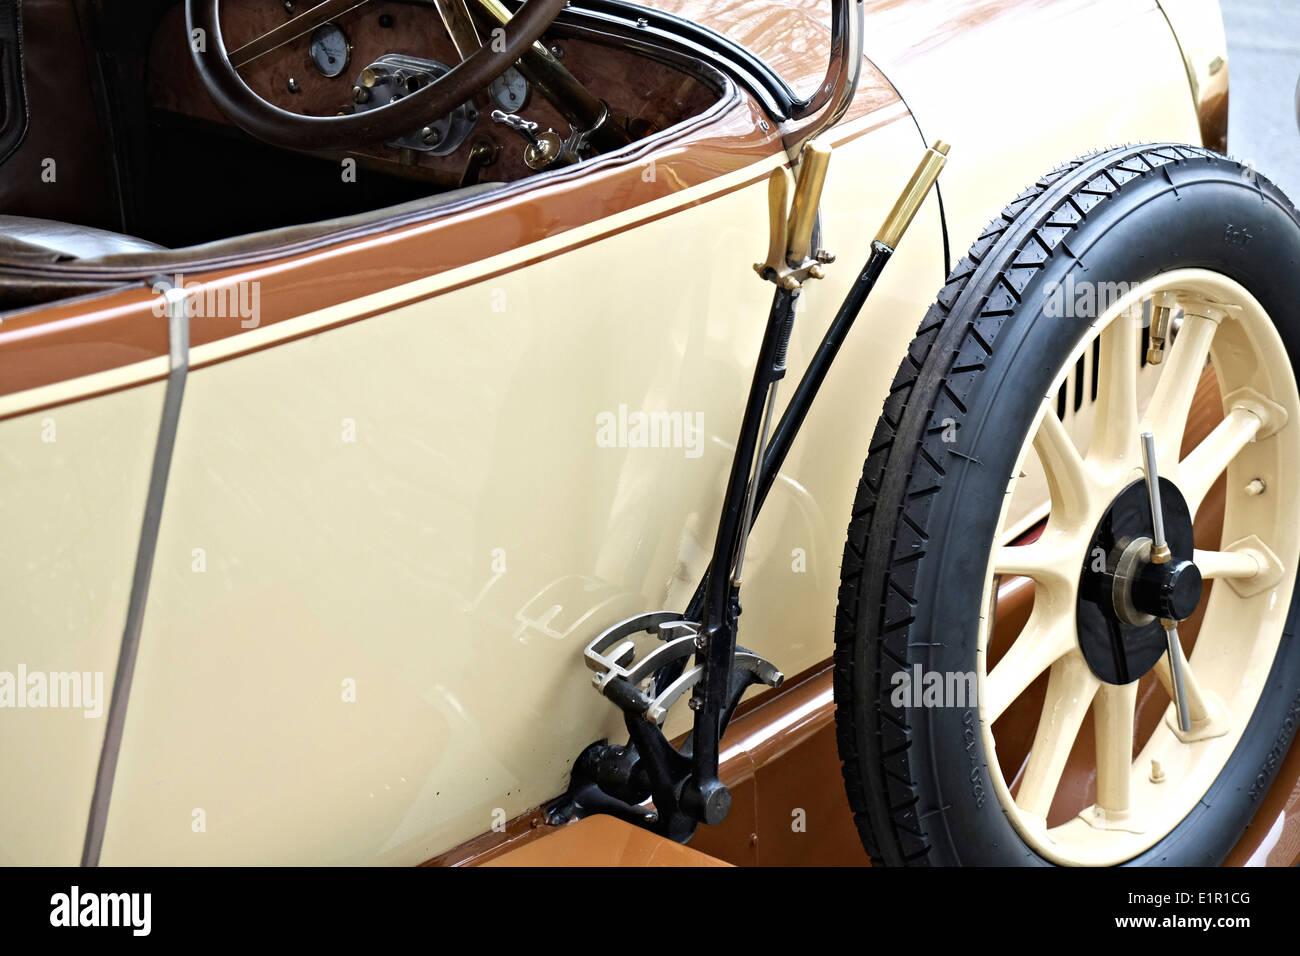 parking brake of an pre-war car,Opel 8/20 Spitzkühler,1920 - Stock Image